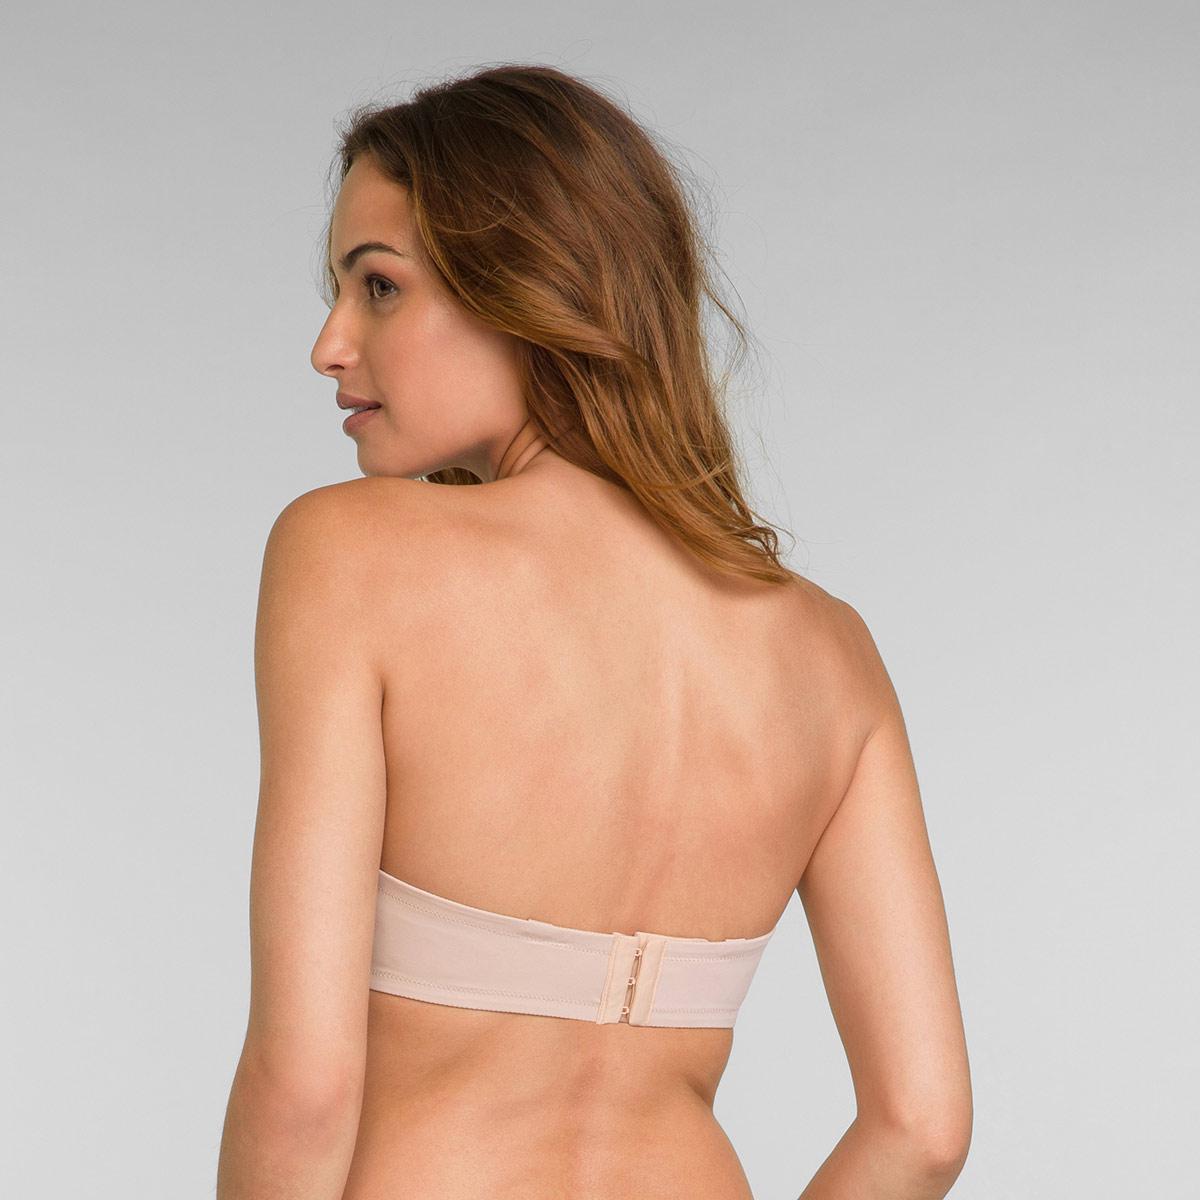 Strapless Bra in Nude Flower Elegance, , PLAYTEX